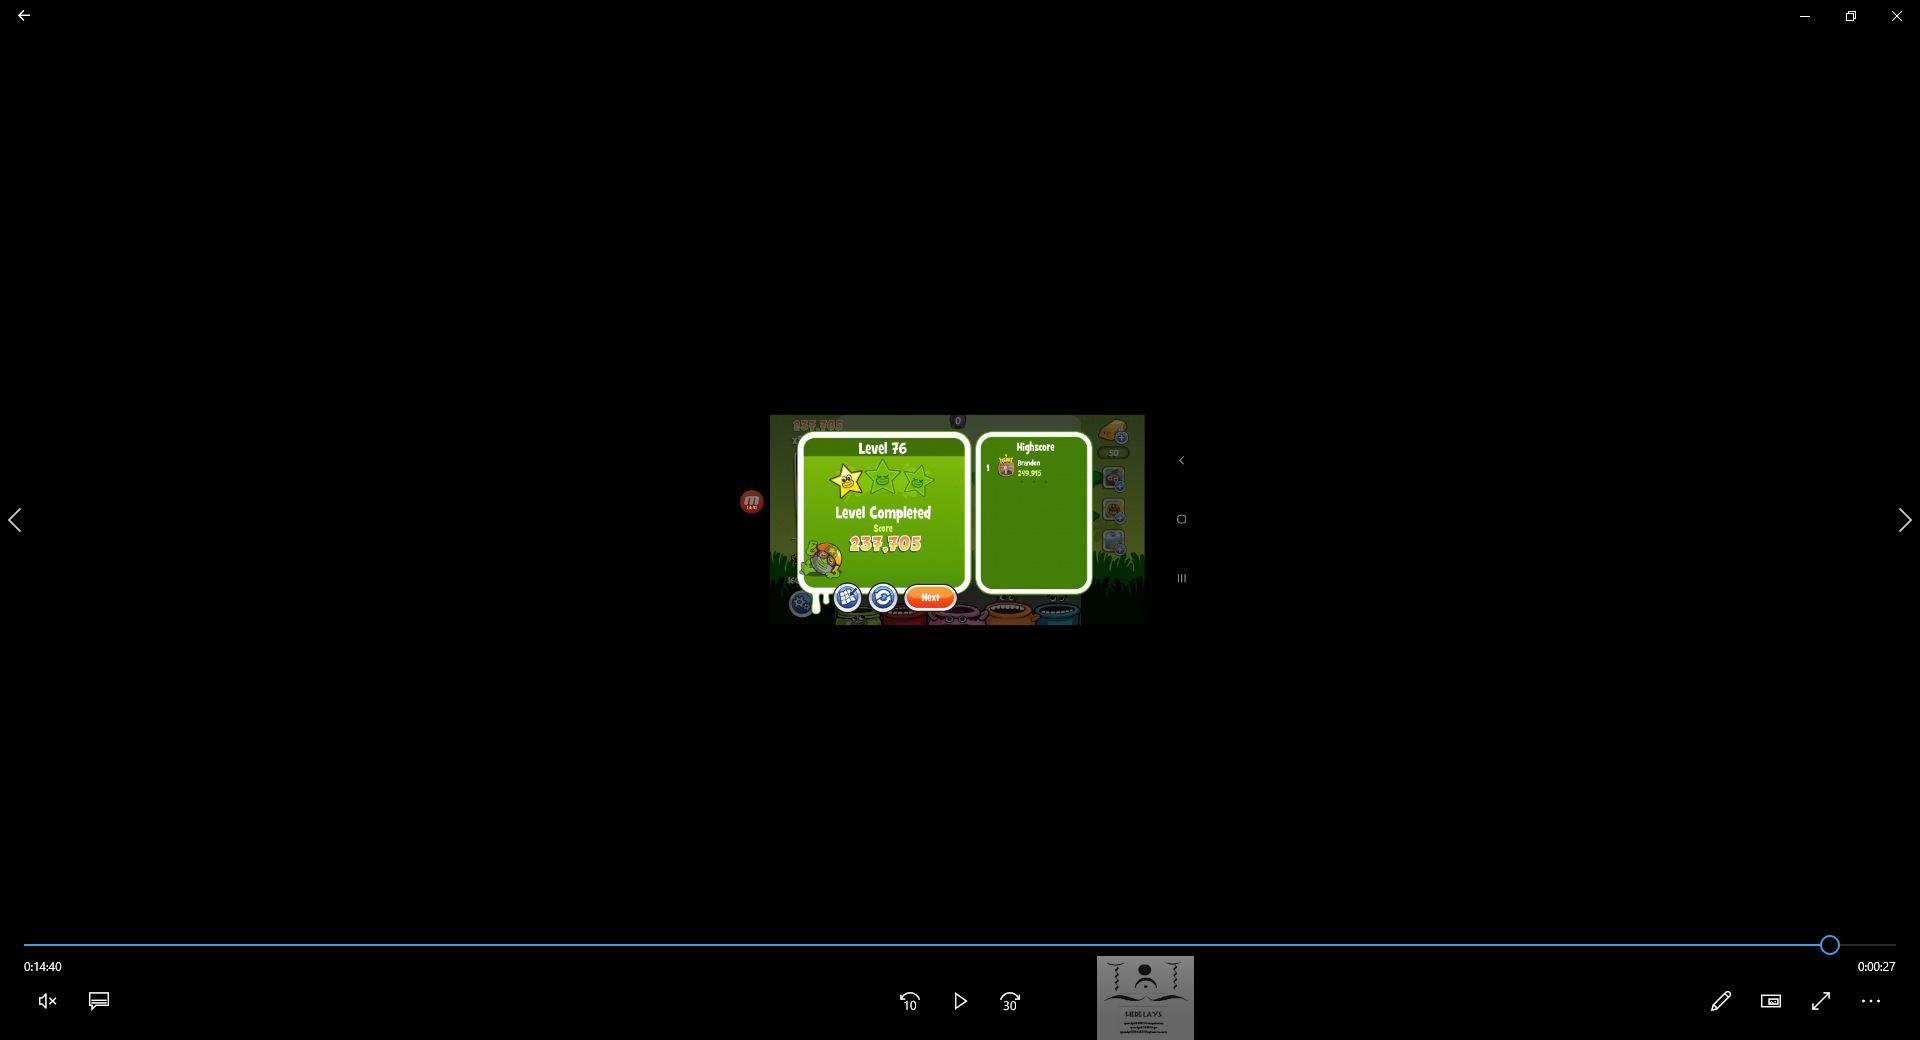 speedy4759123: Papa Pear Saga: Level 076 (Android) 237,705 points on 2020-08-11 15:52:08